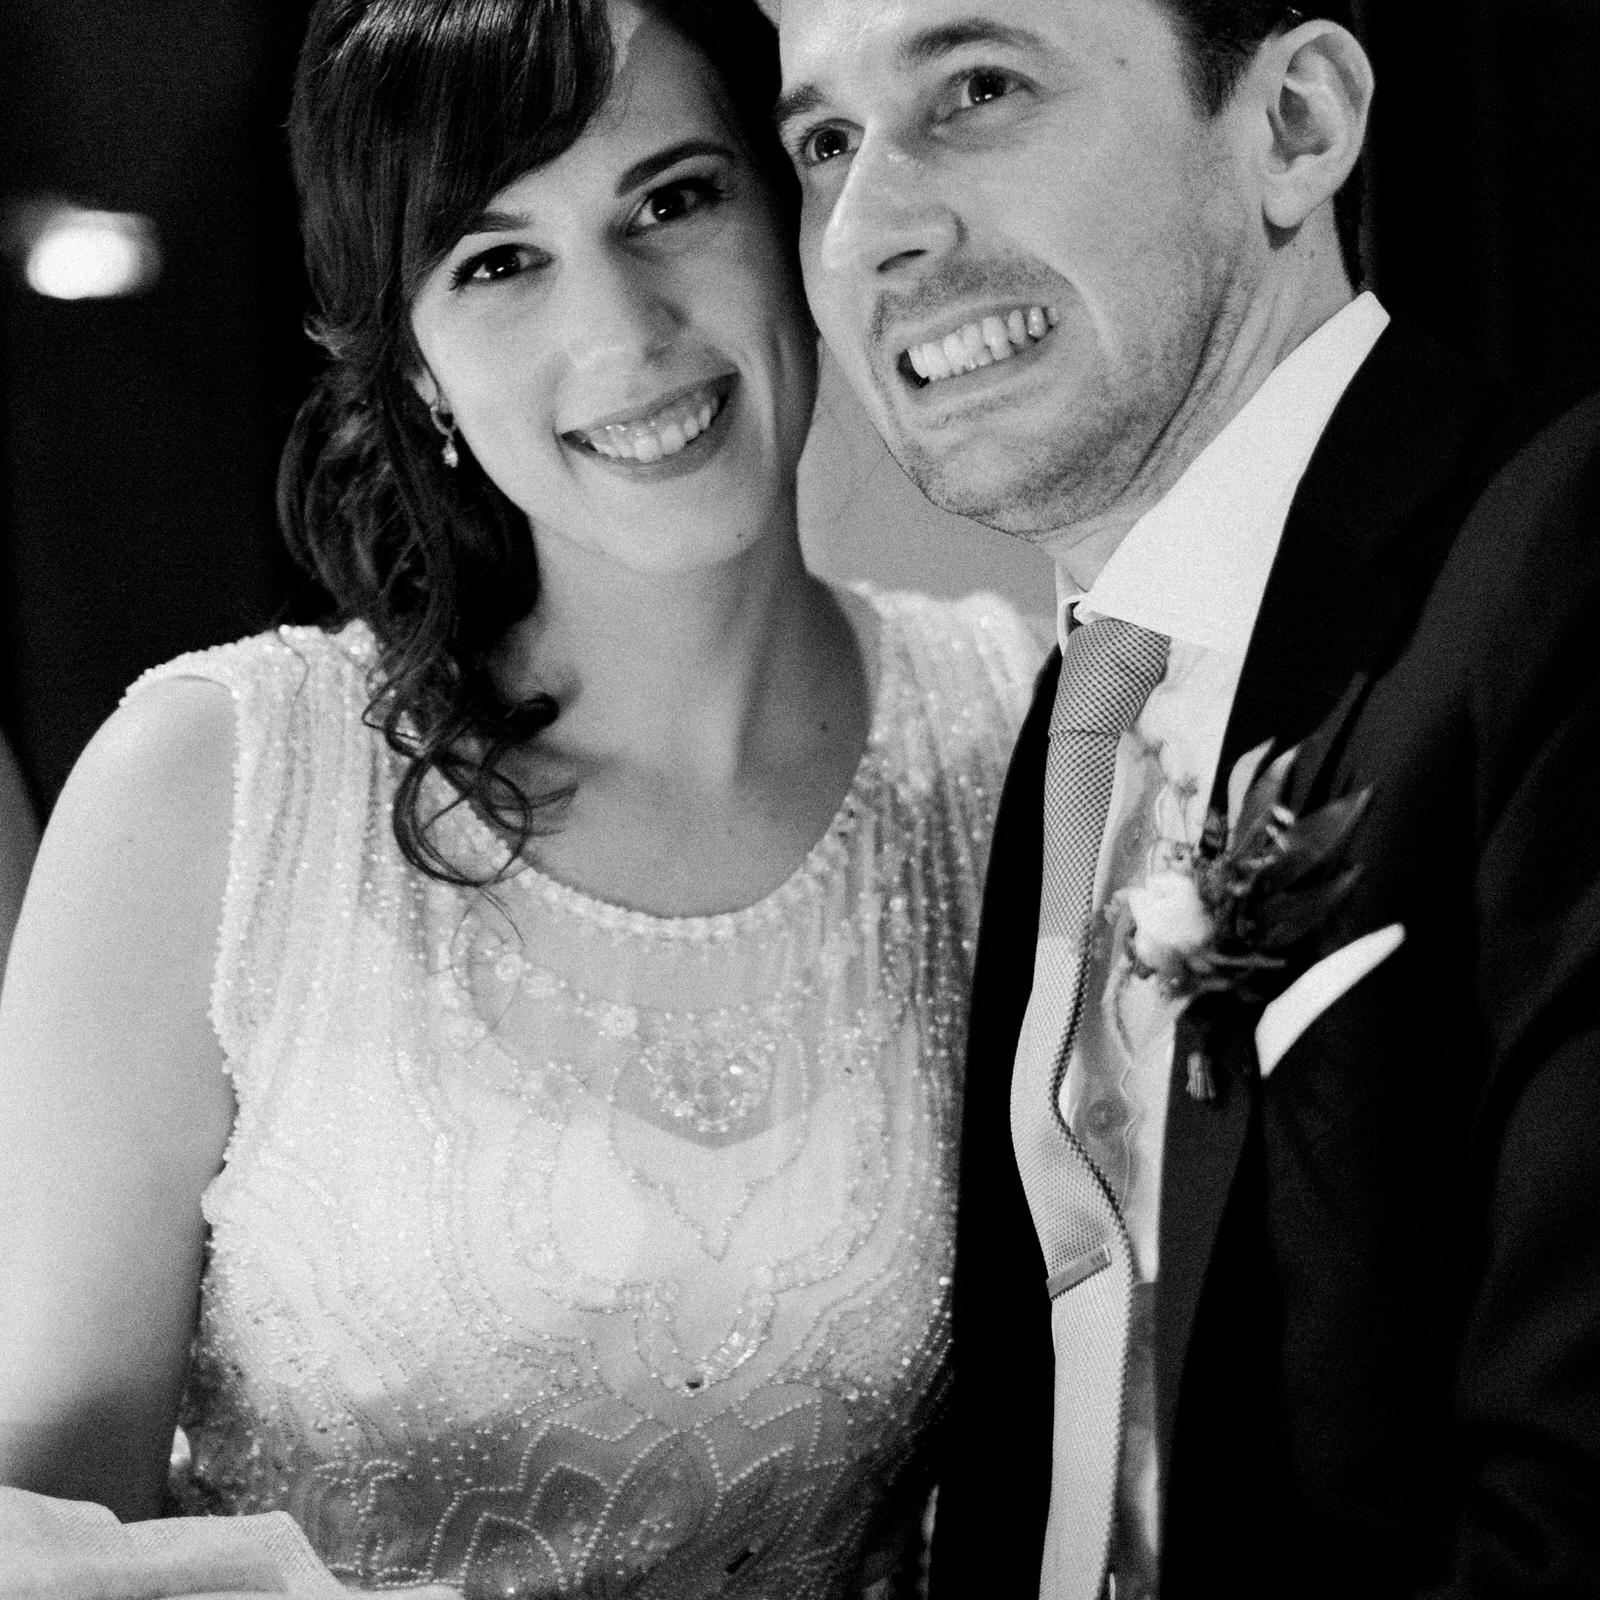 chryssi_romain_wedding_356.JPG